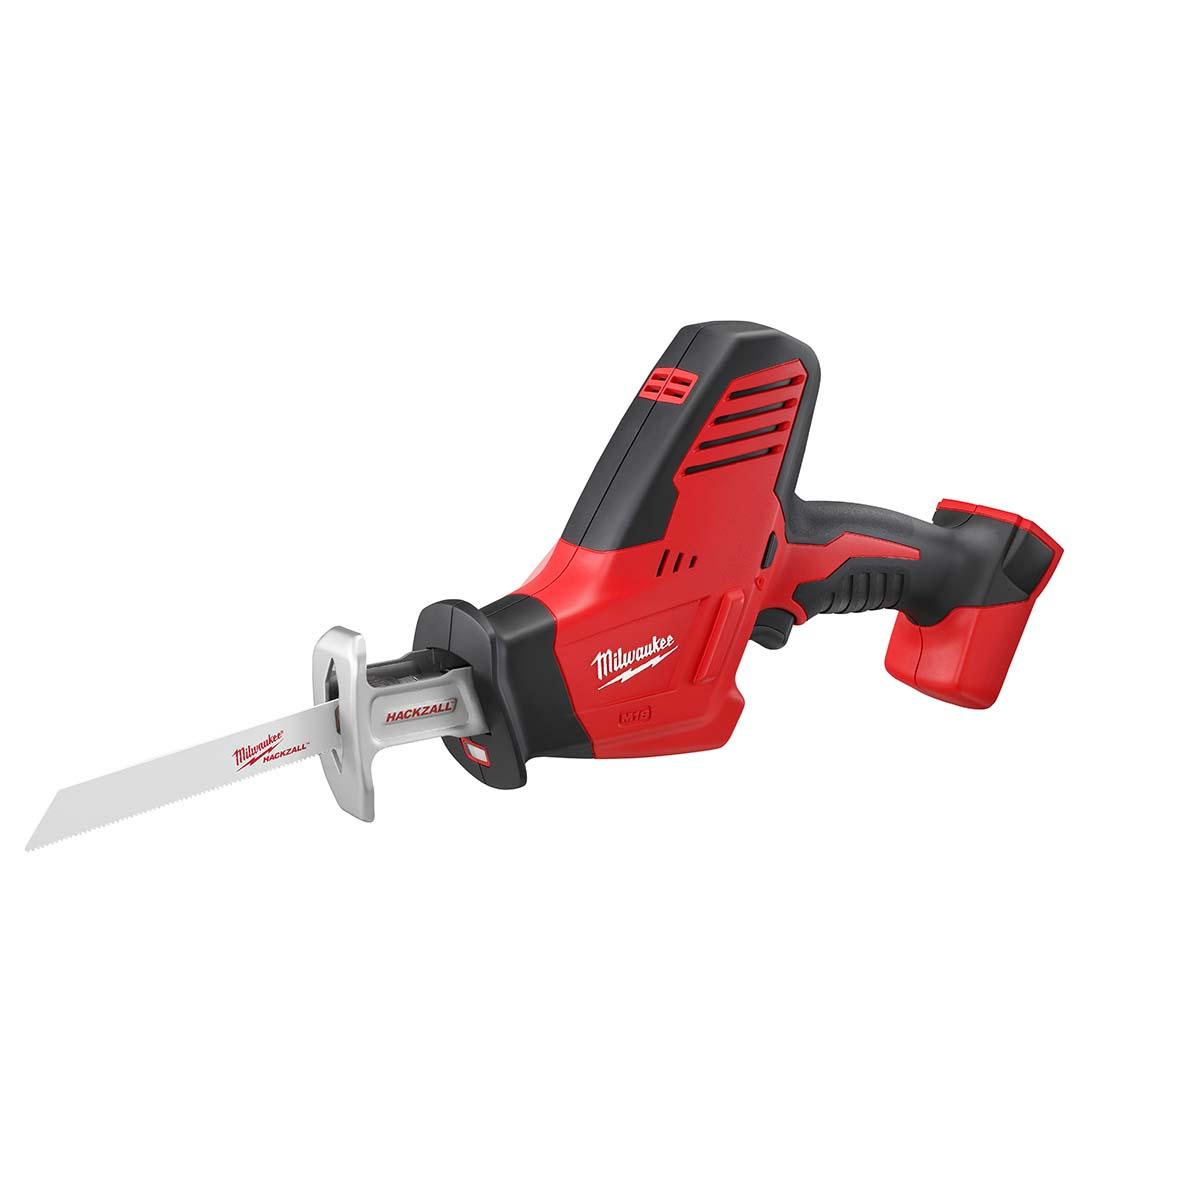 M18™ HACKZALL® Recip Saw (Bare Tool)